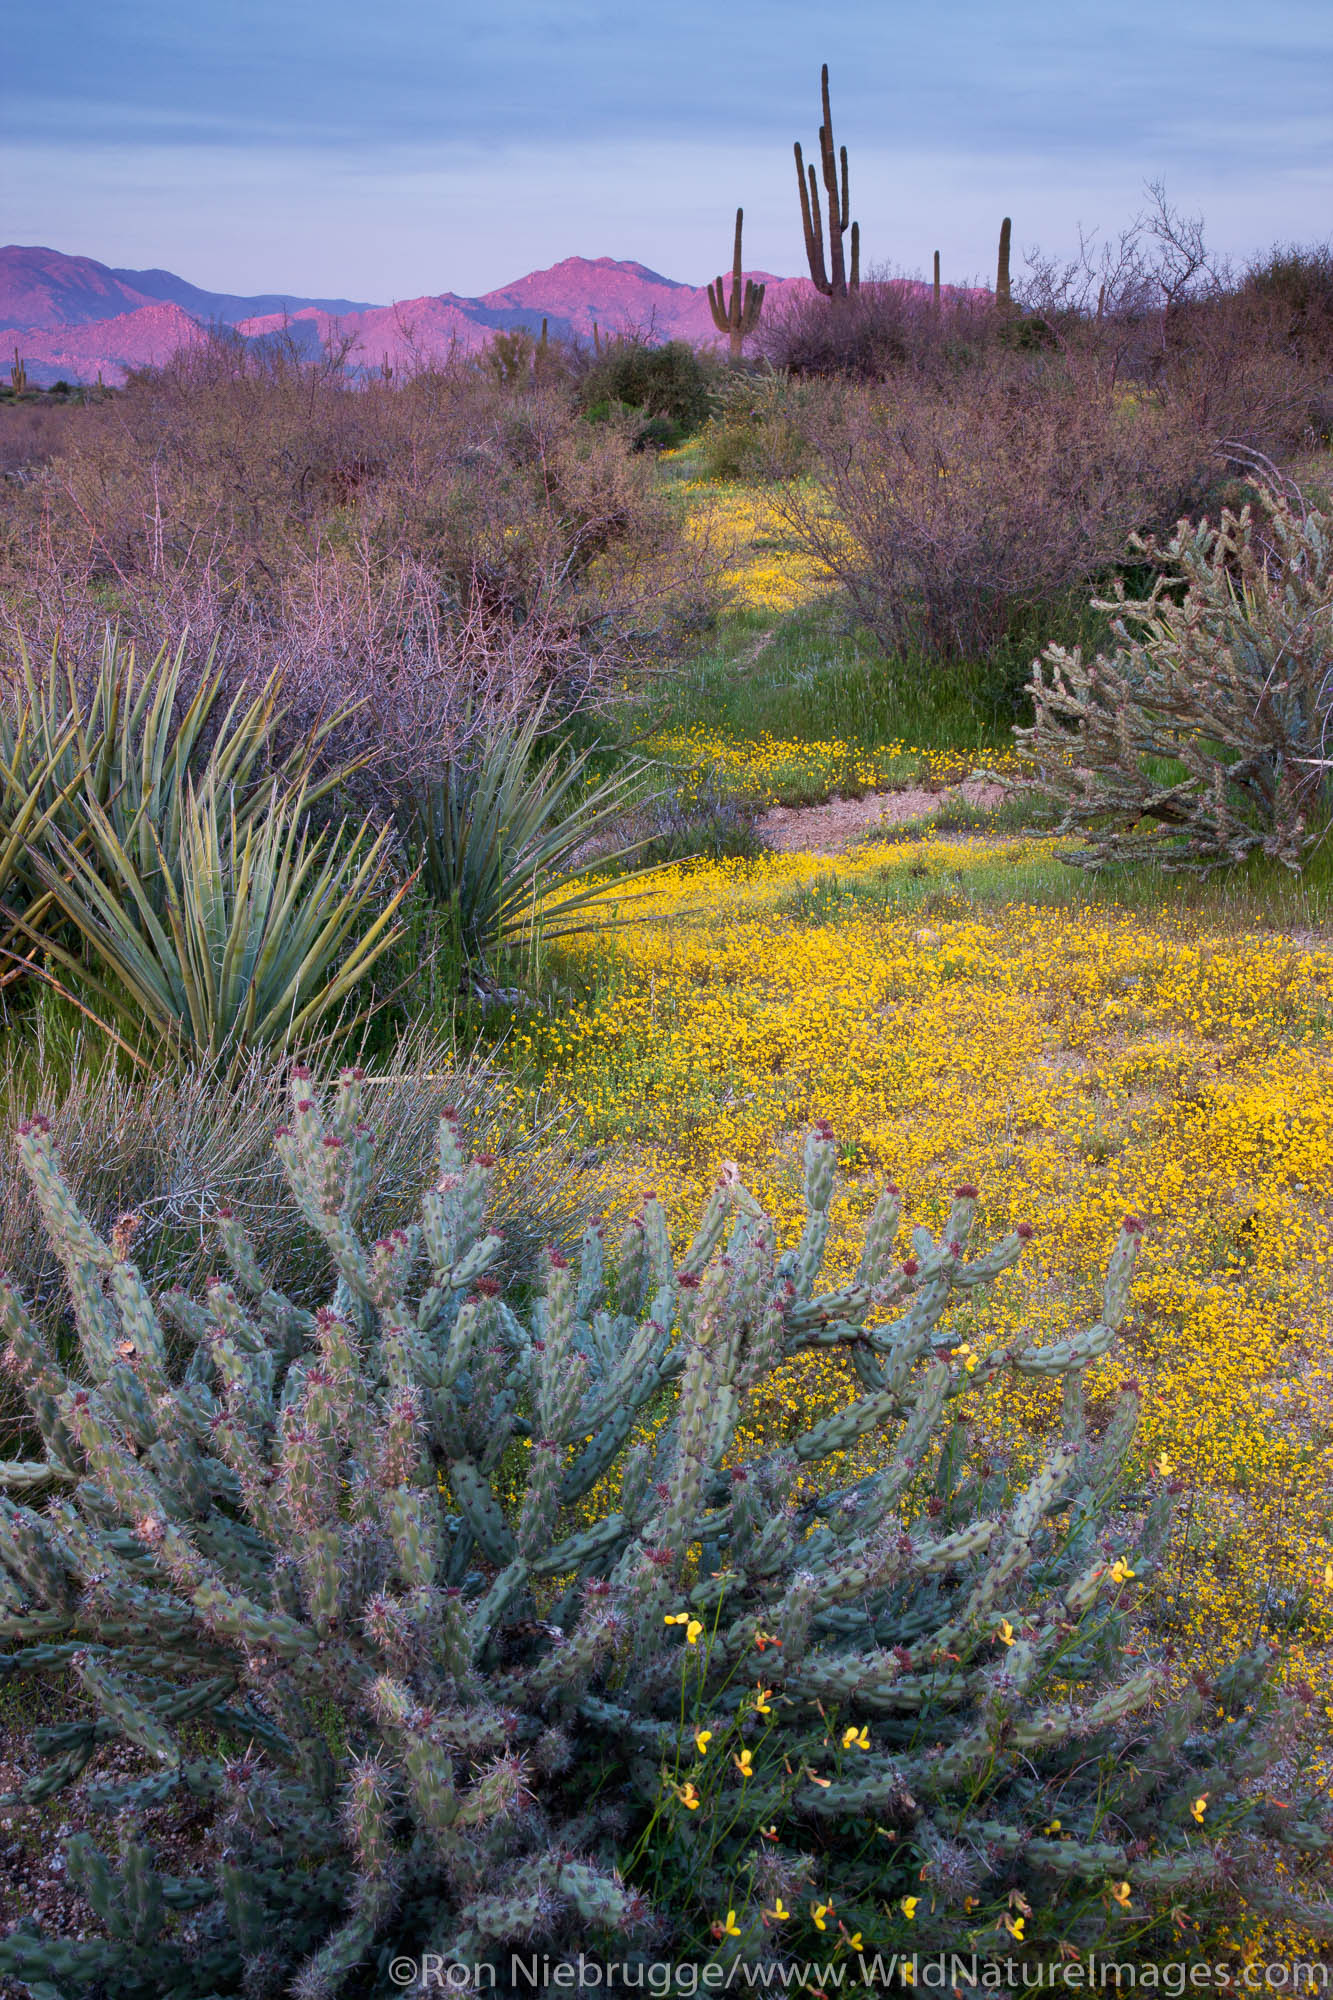 Tonto National Forest, East of Phoenix, Arizona.